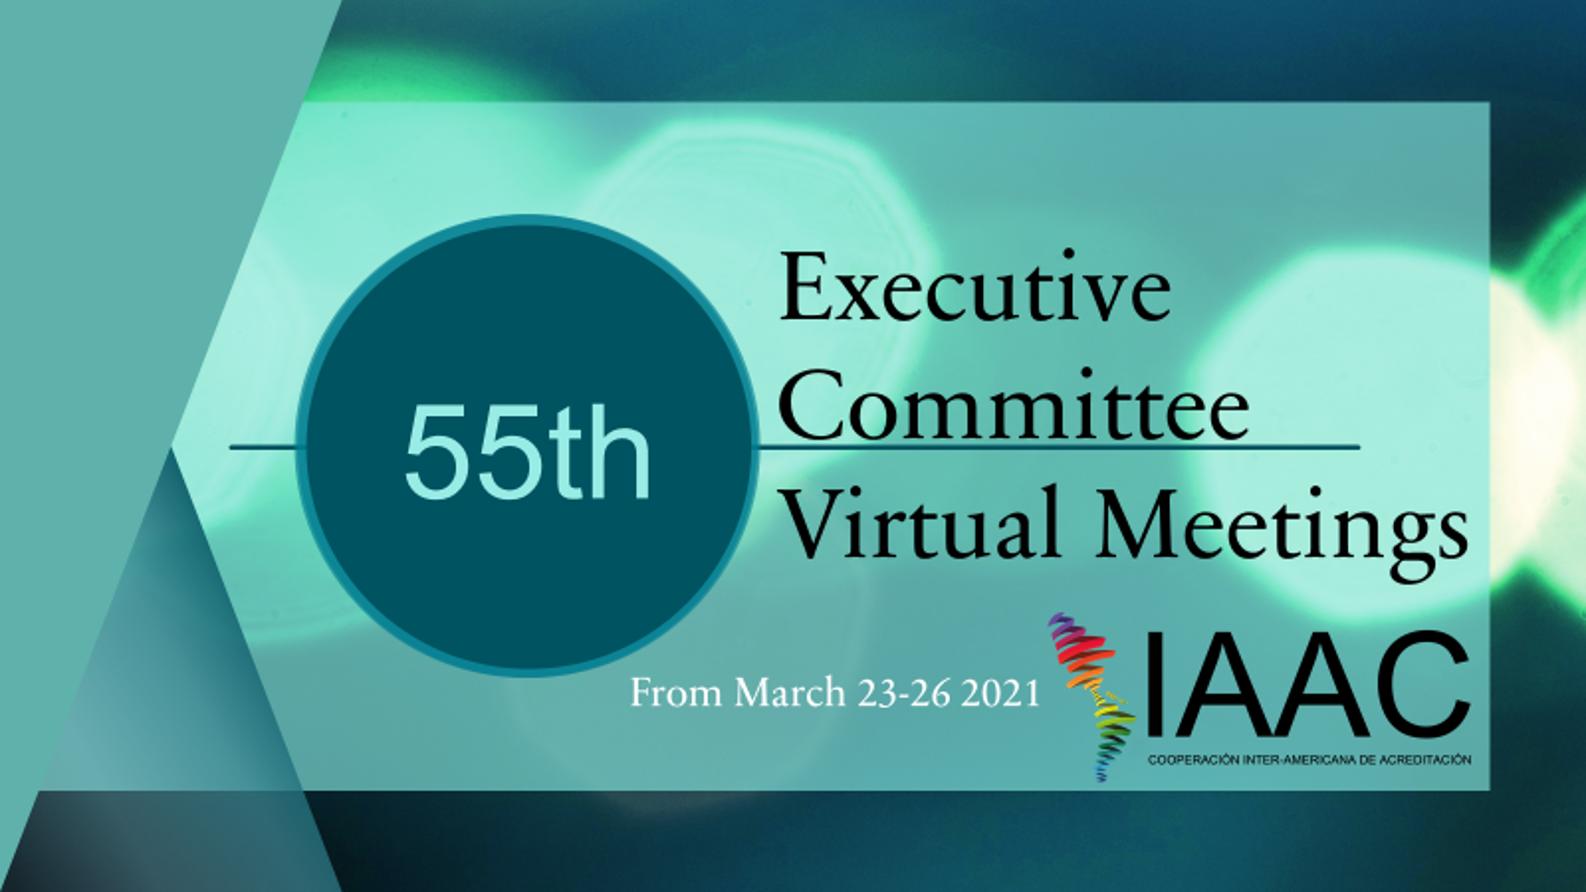 IAAC 55th Executive Committee